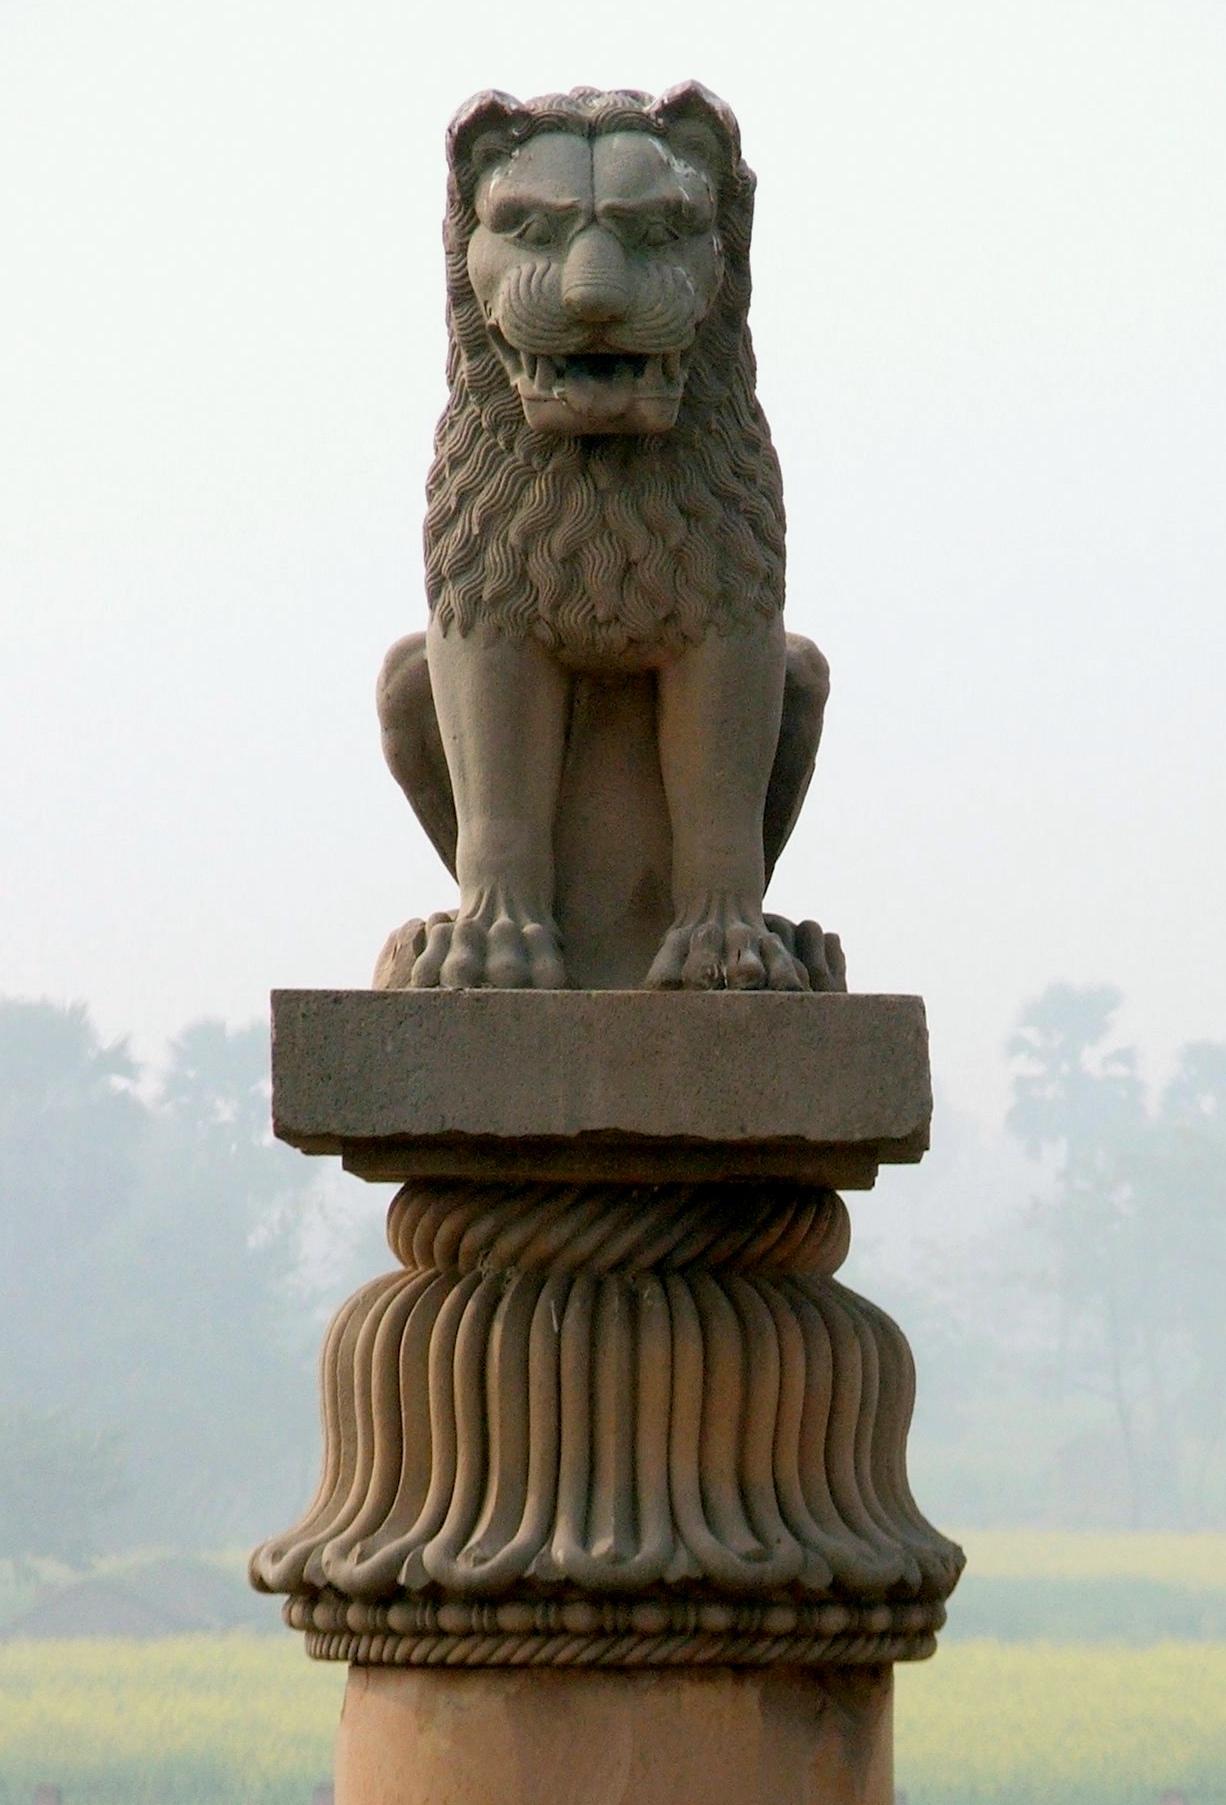 Ashoka's Pillars